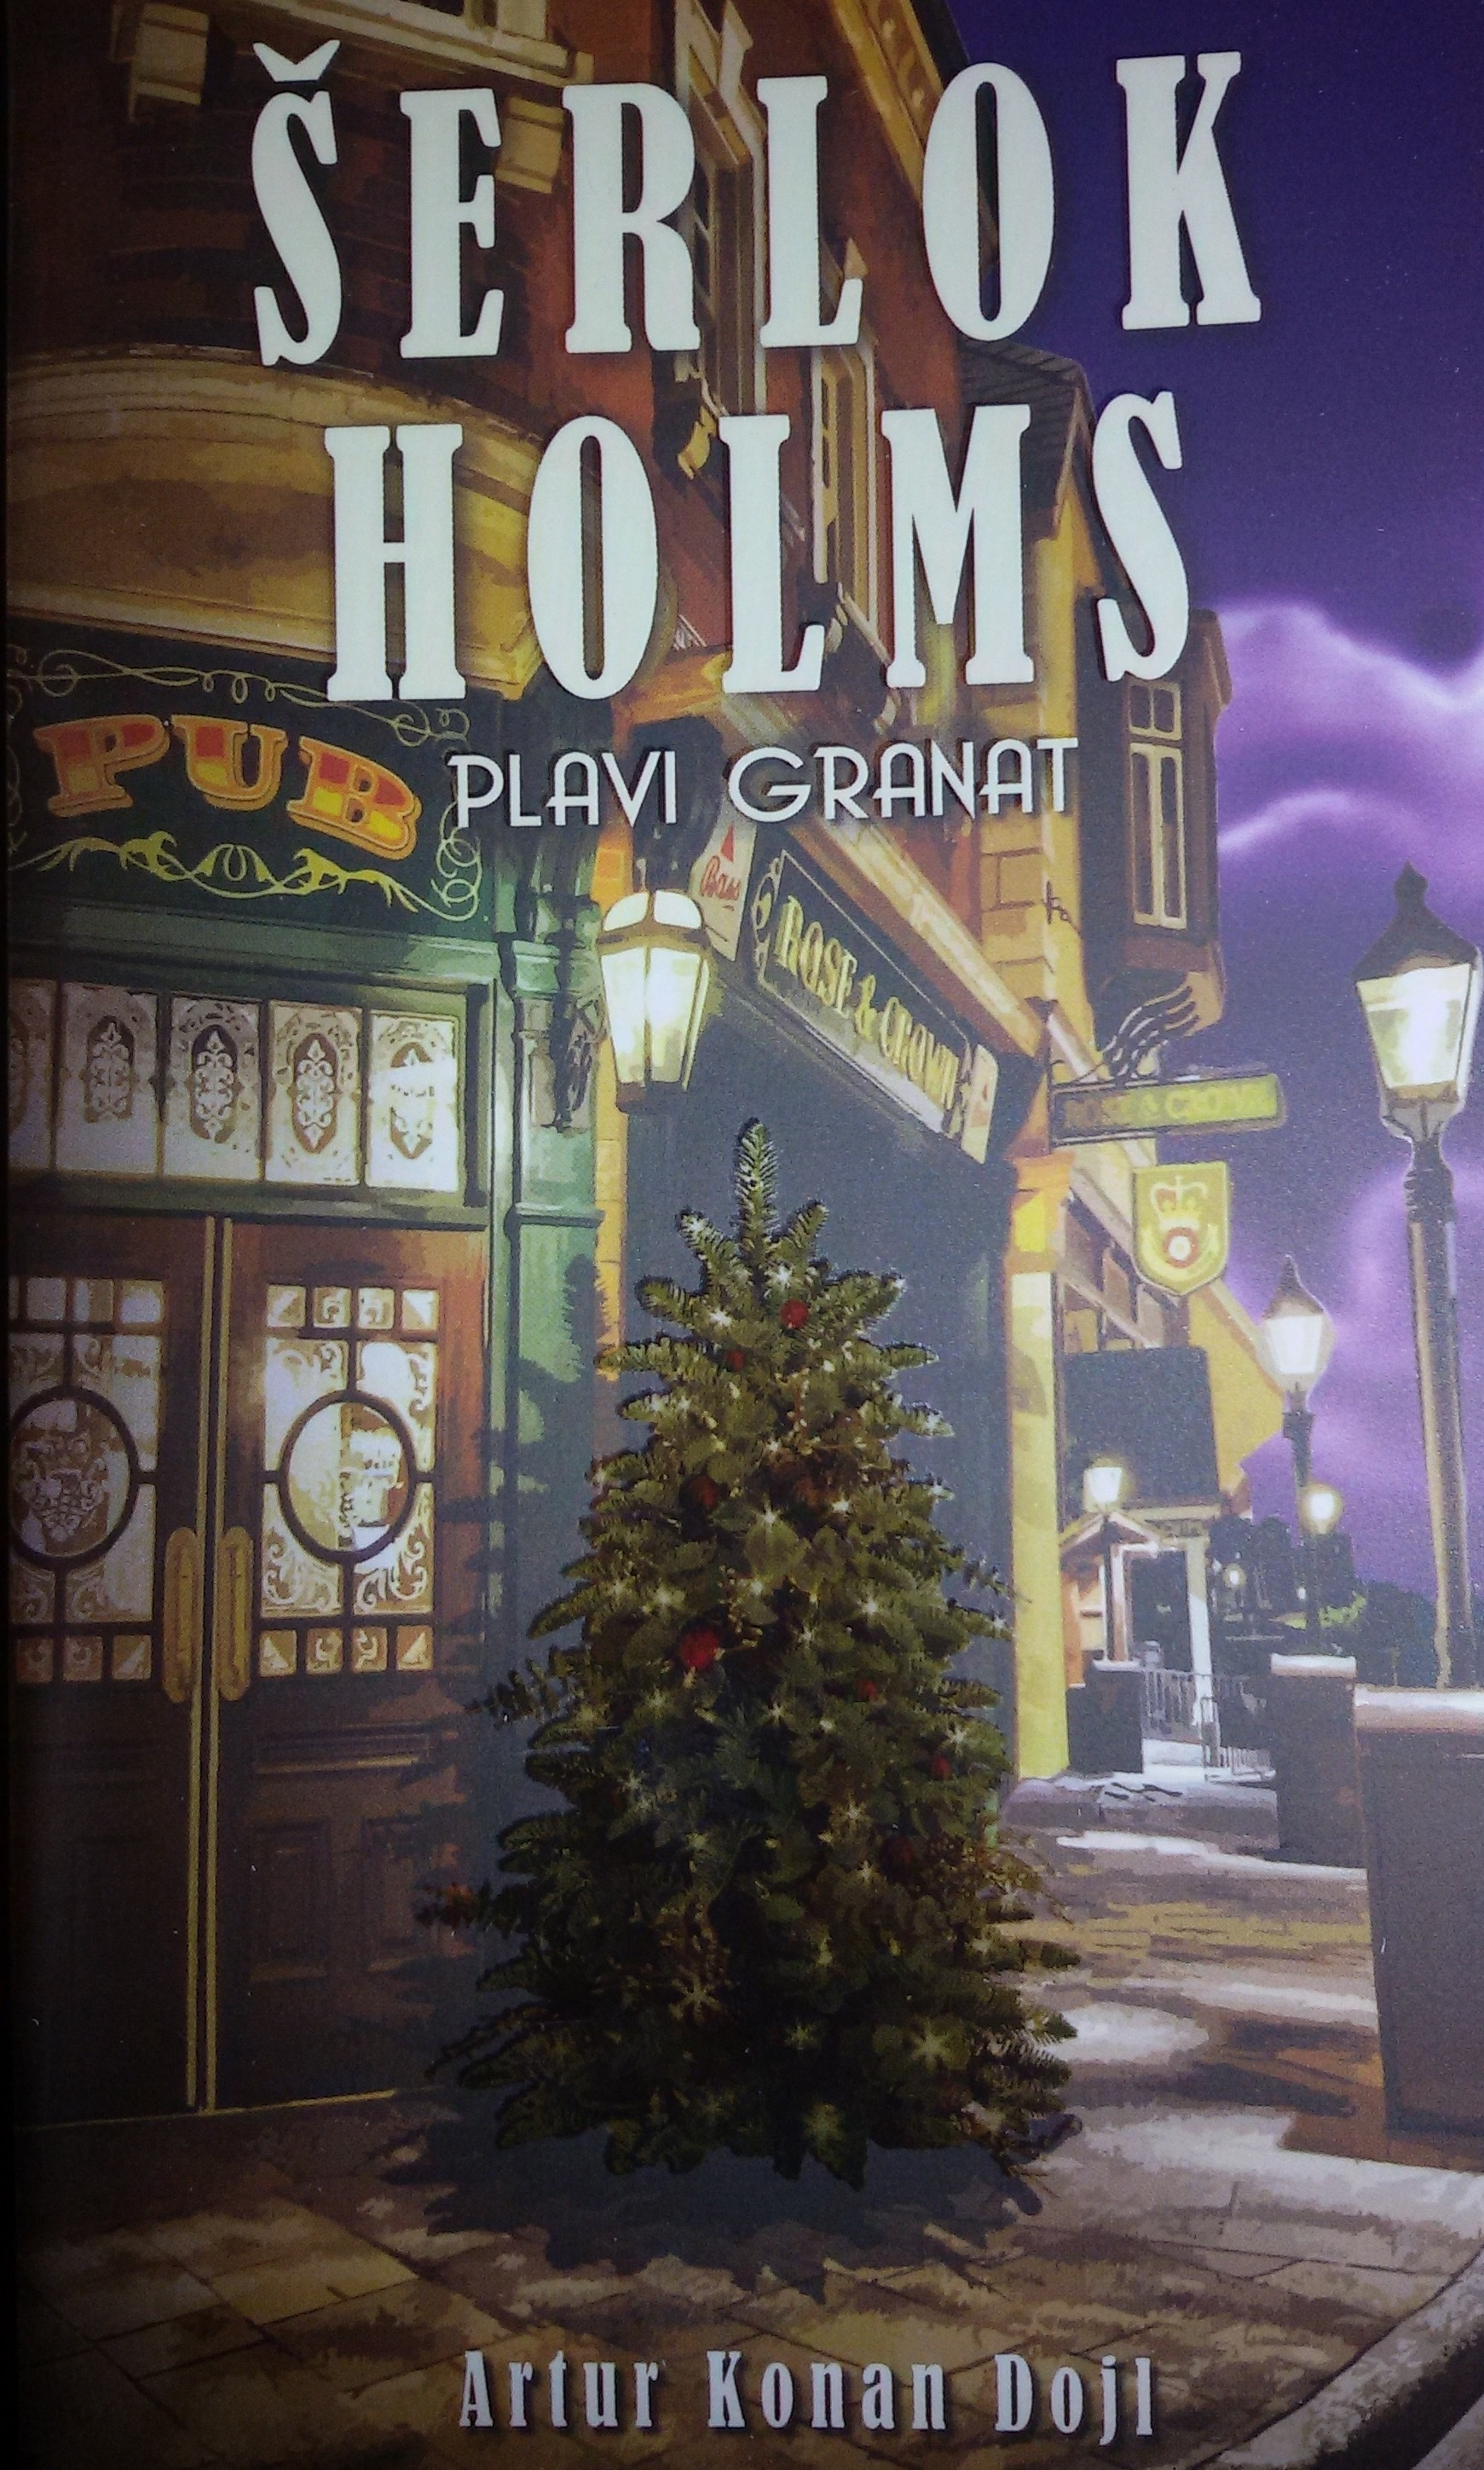 Šerlok Holms: Plavi granat (The Adventures of Sherlock Holmes 7 - 12)